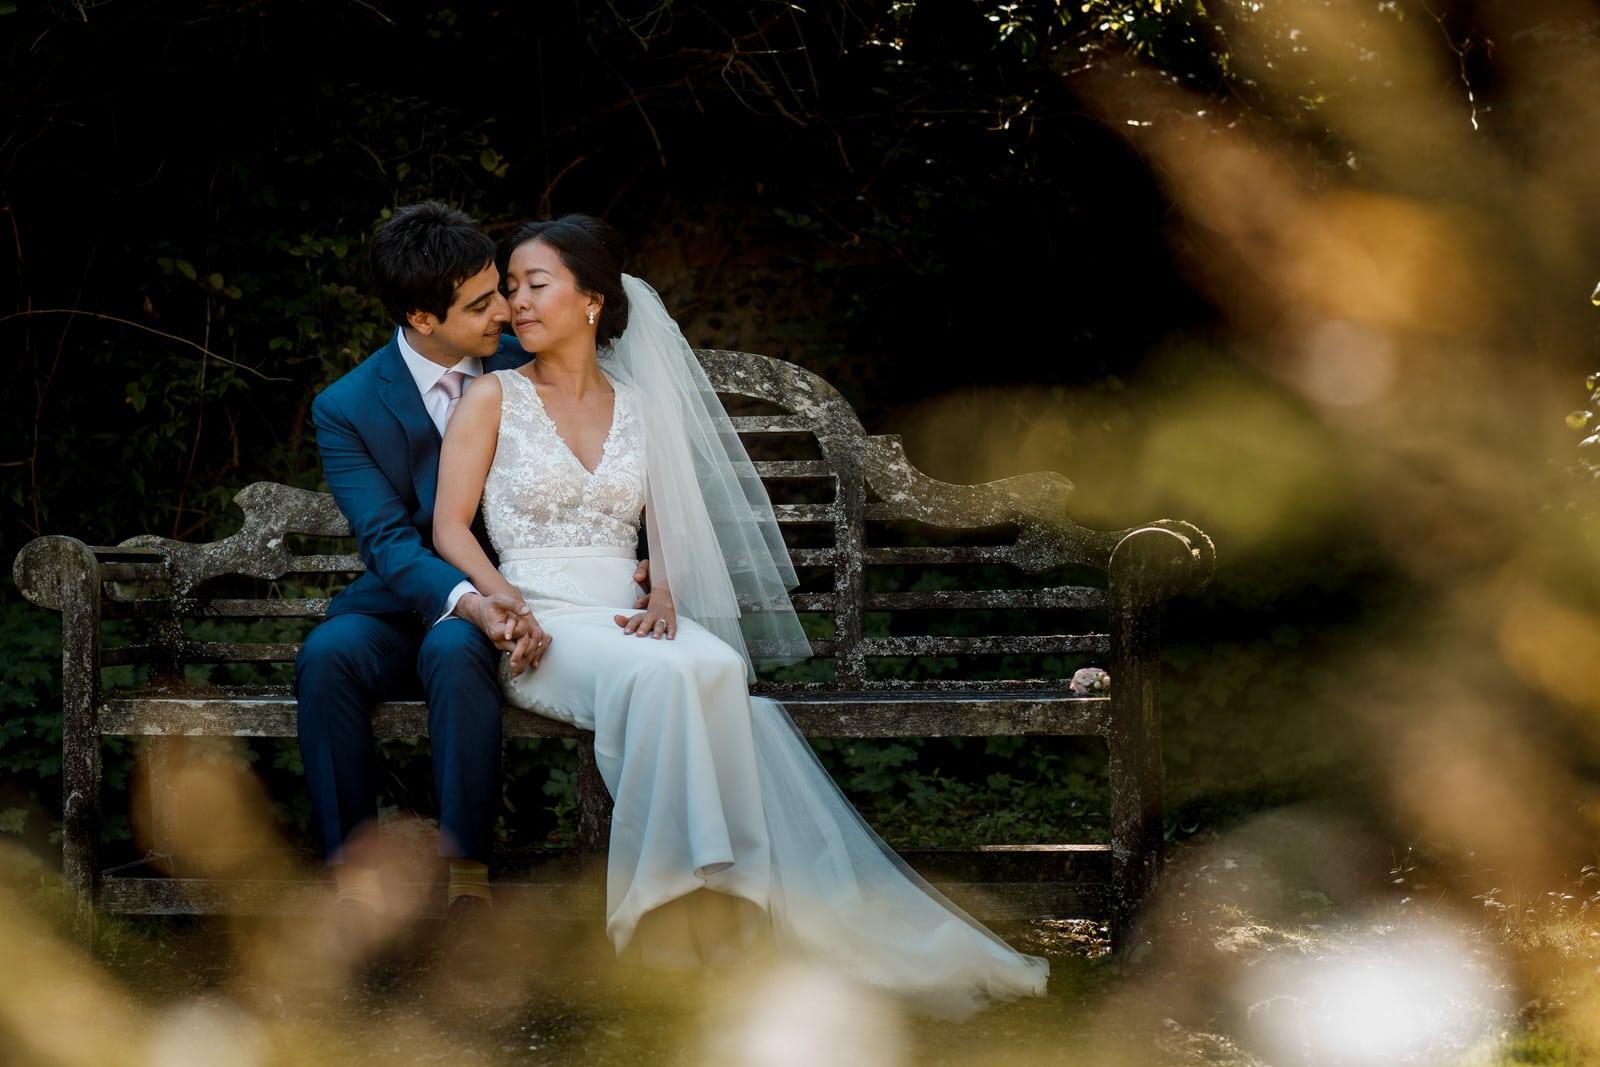 newlyweds sitting on bench